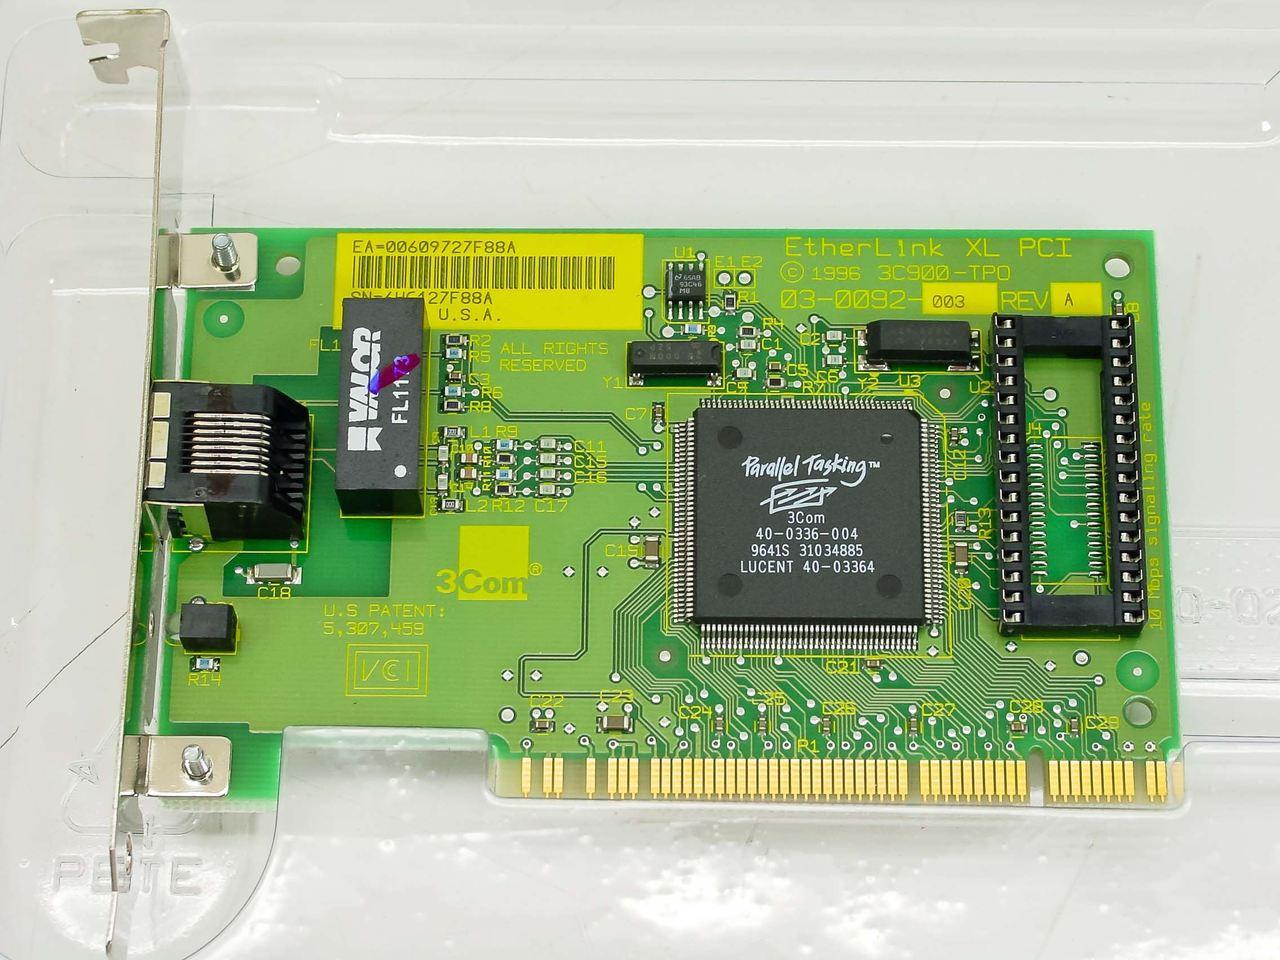 3COM ETHERLINK PCI TPO NIC 3C900-TPO DRIVERS DOWNLOAD (2019)